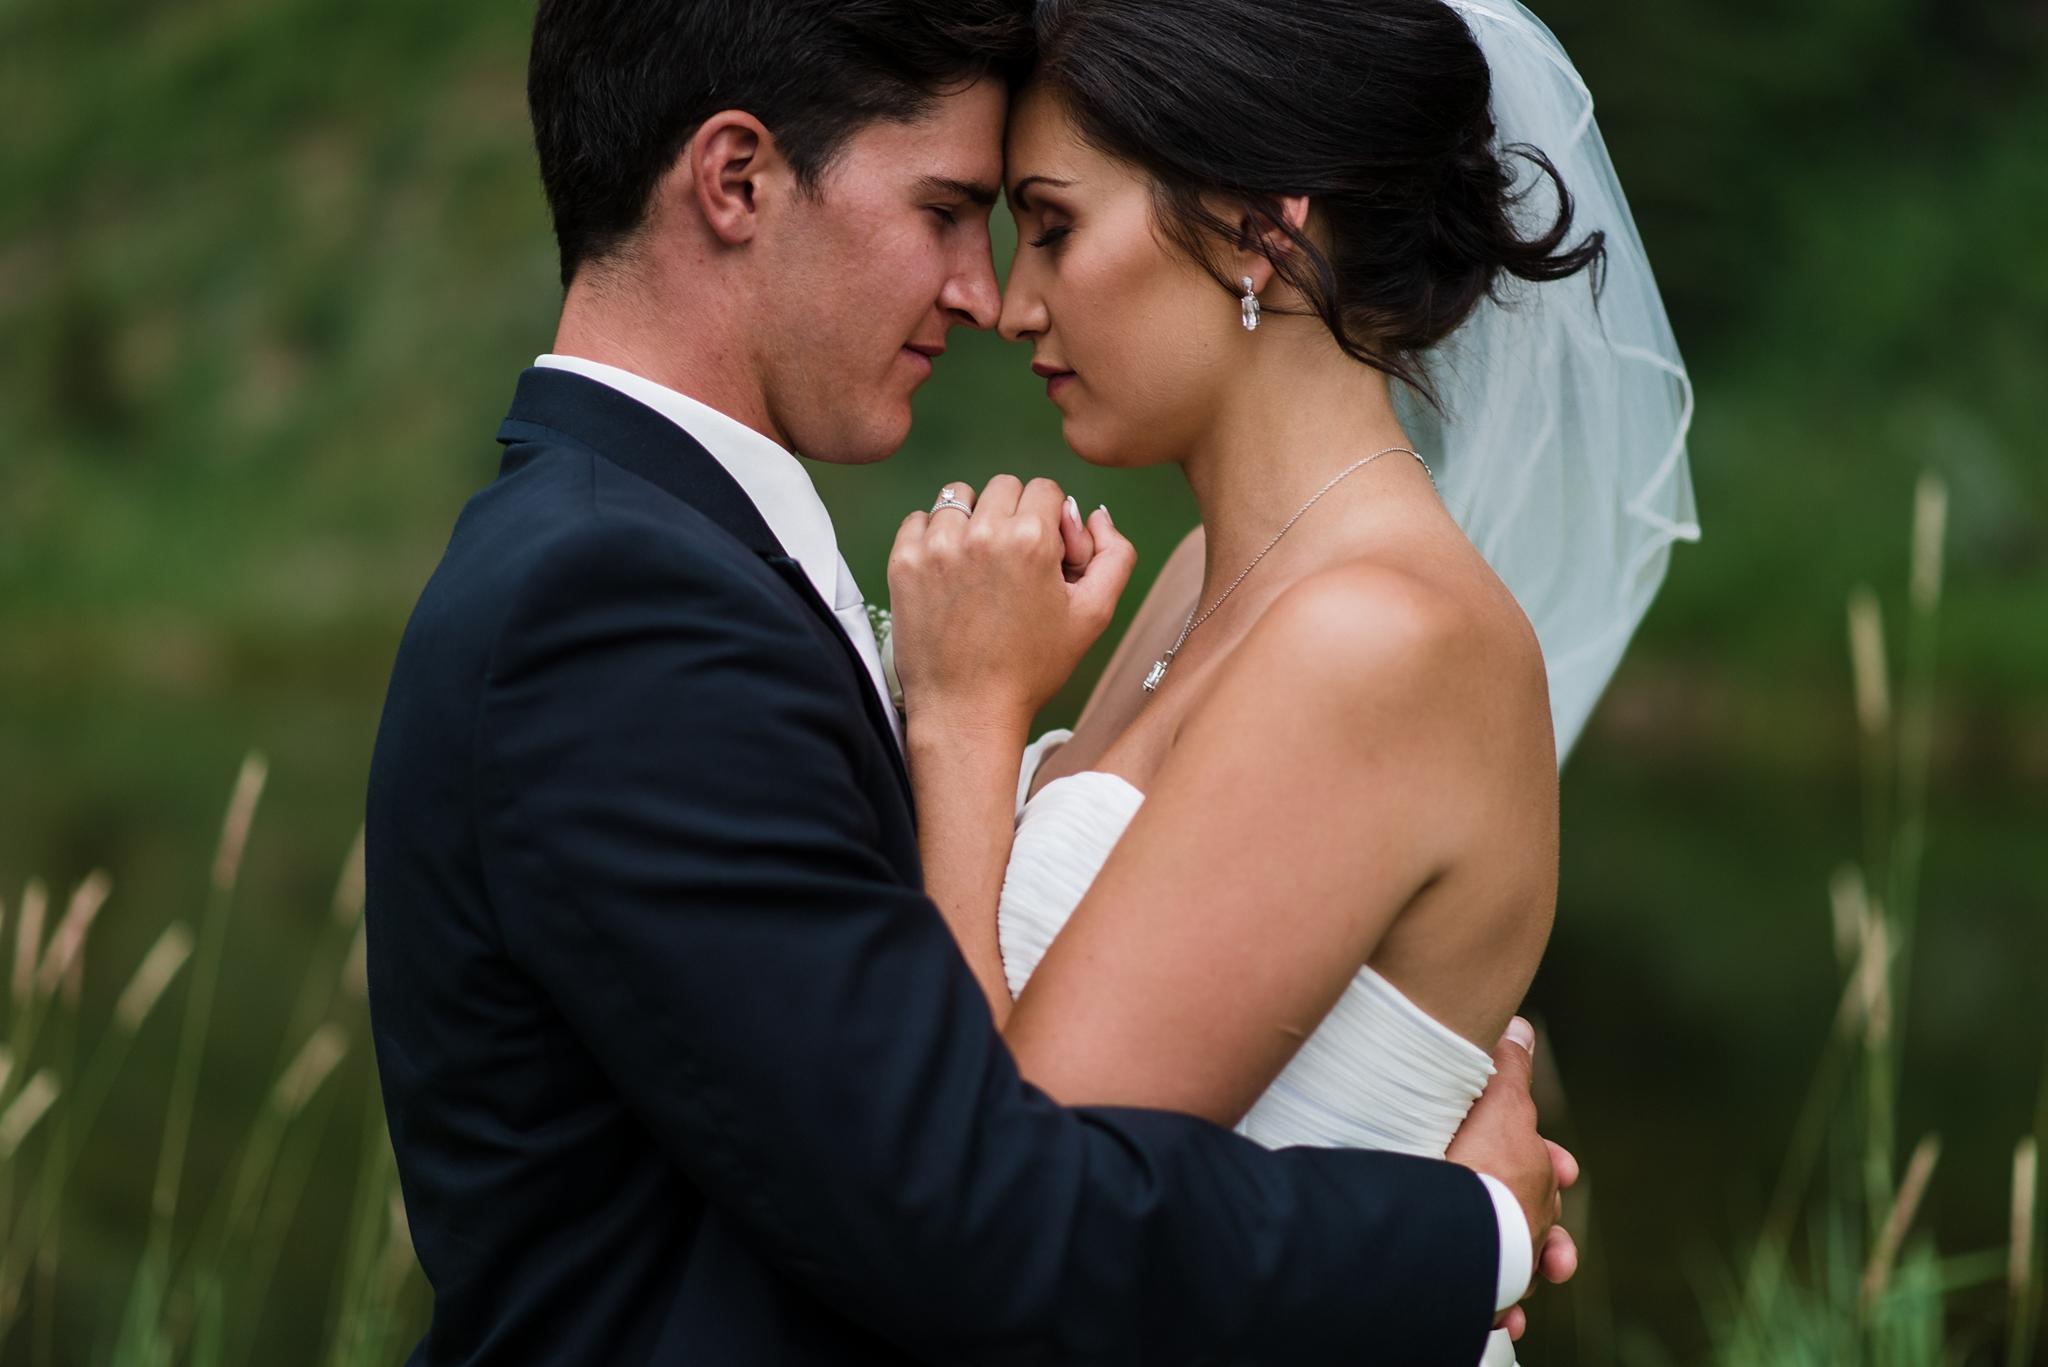 kaihla_tonai_intimate_wedding_elopement_photographer_0106